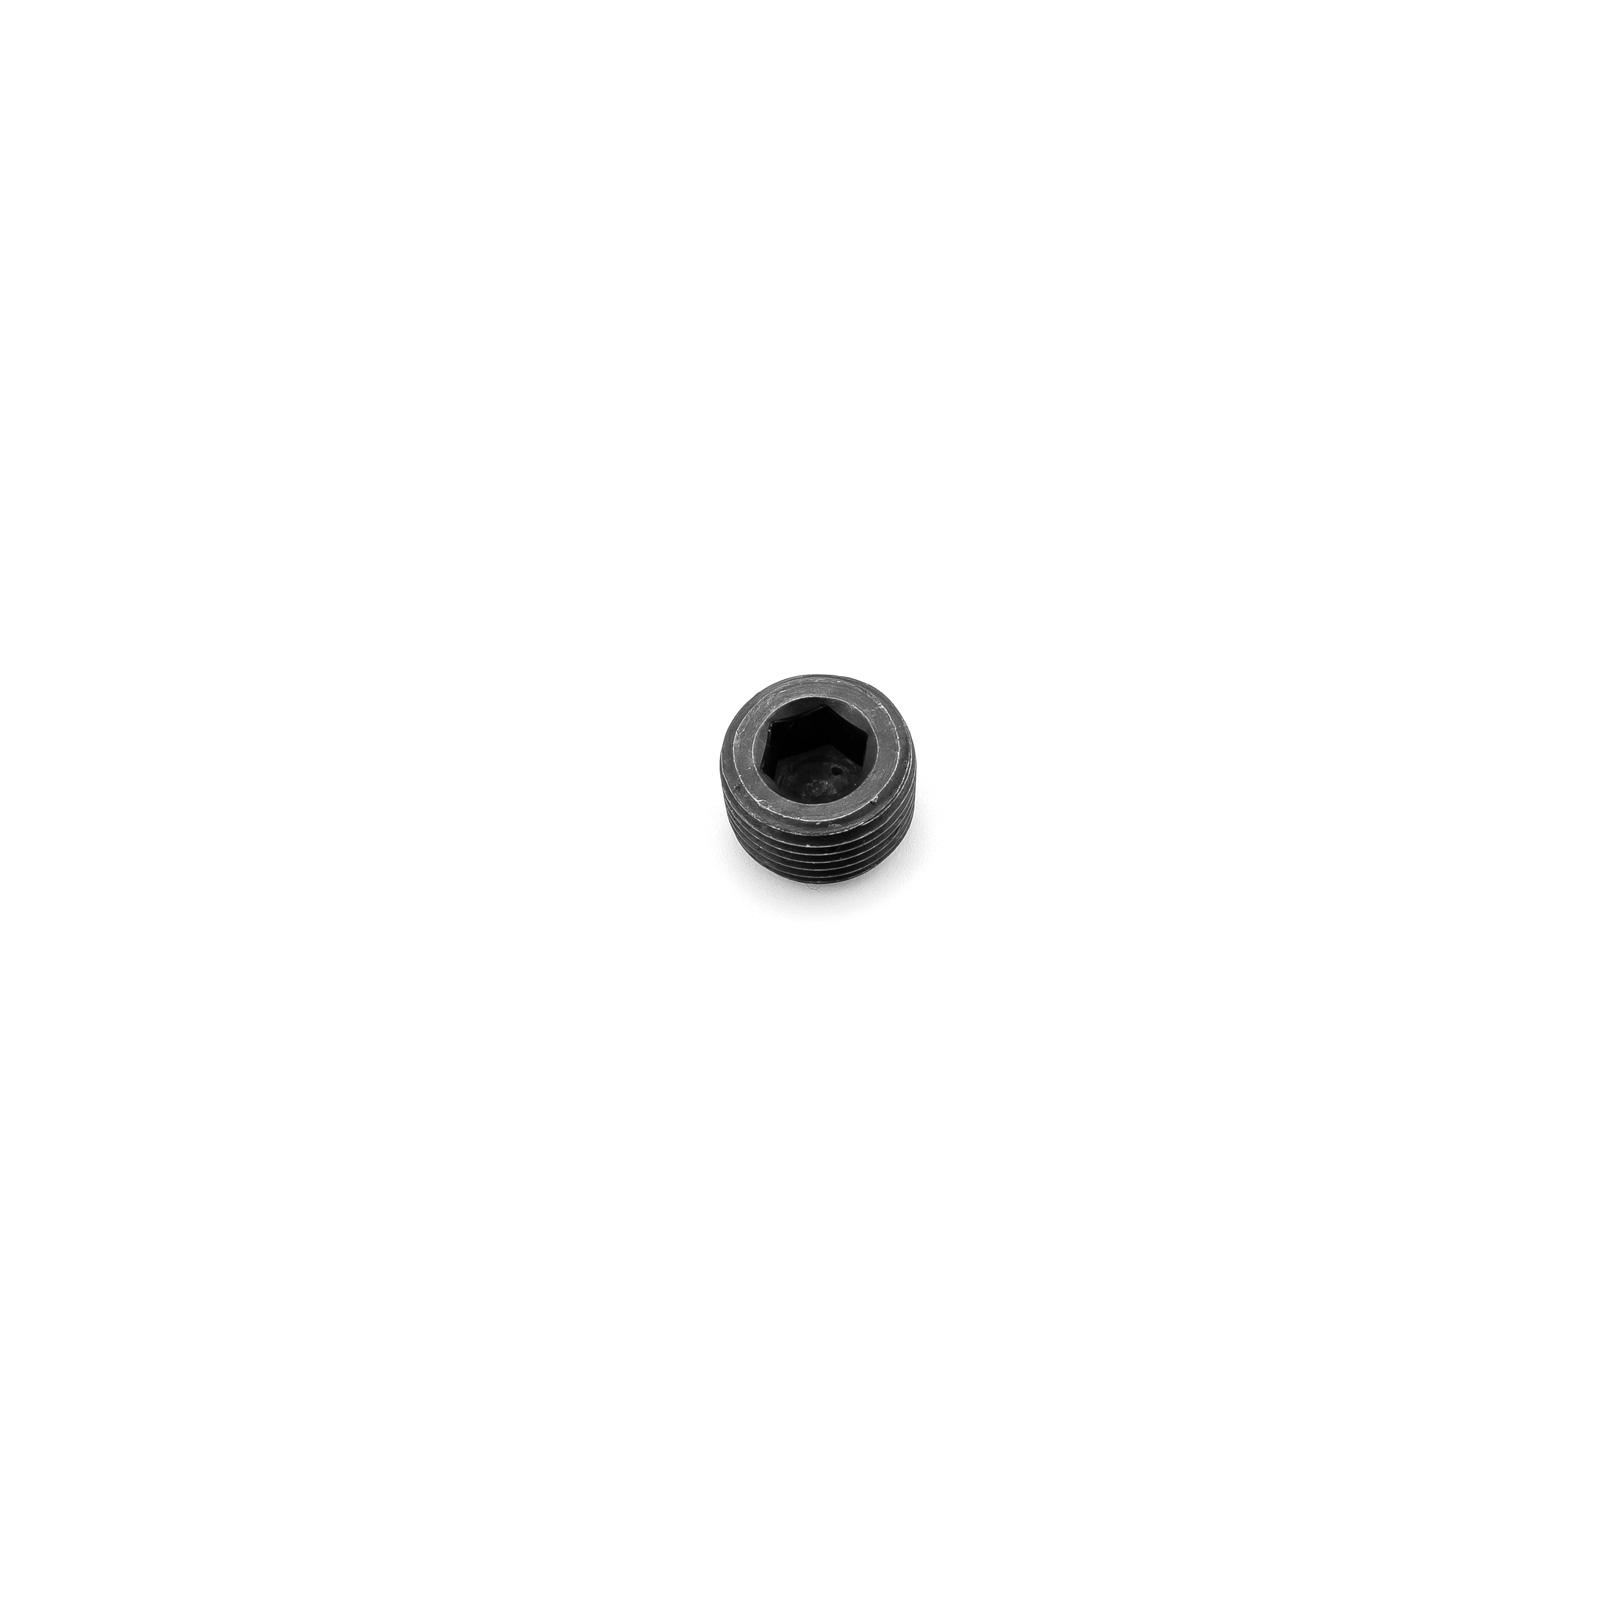 "Internal Allen Head Pipe Plug Fitting 5/8"" NPT Black Anodized"